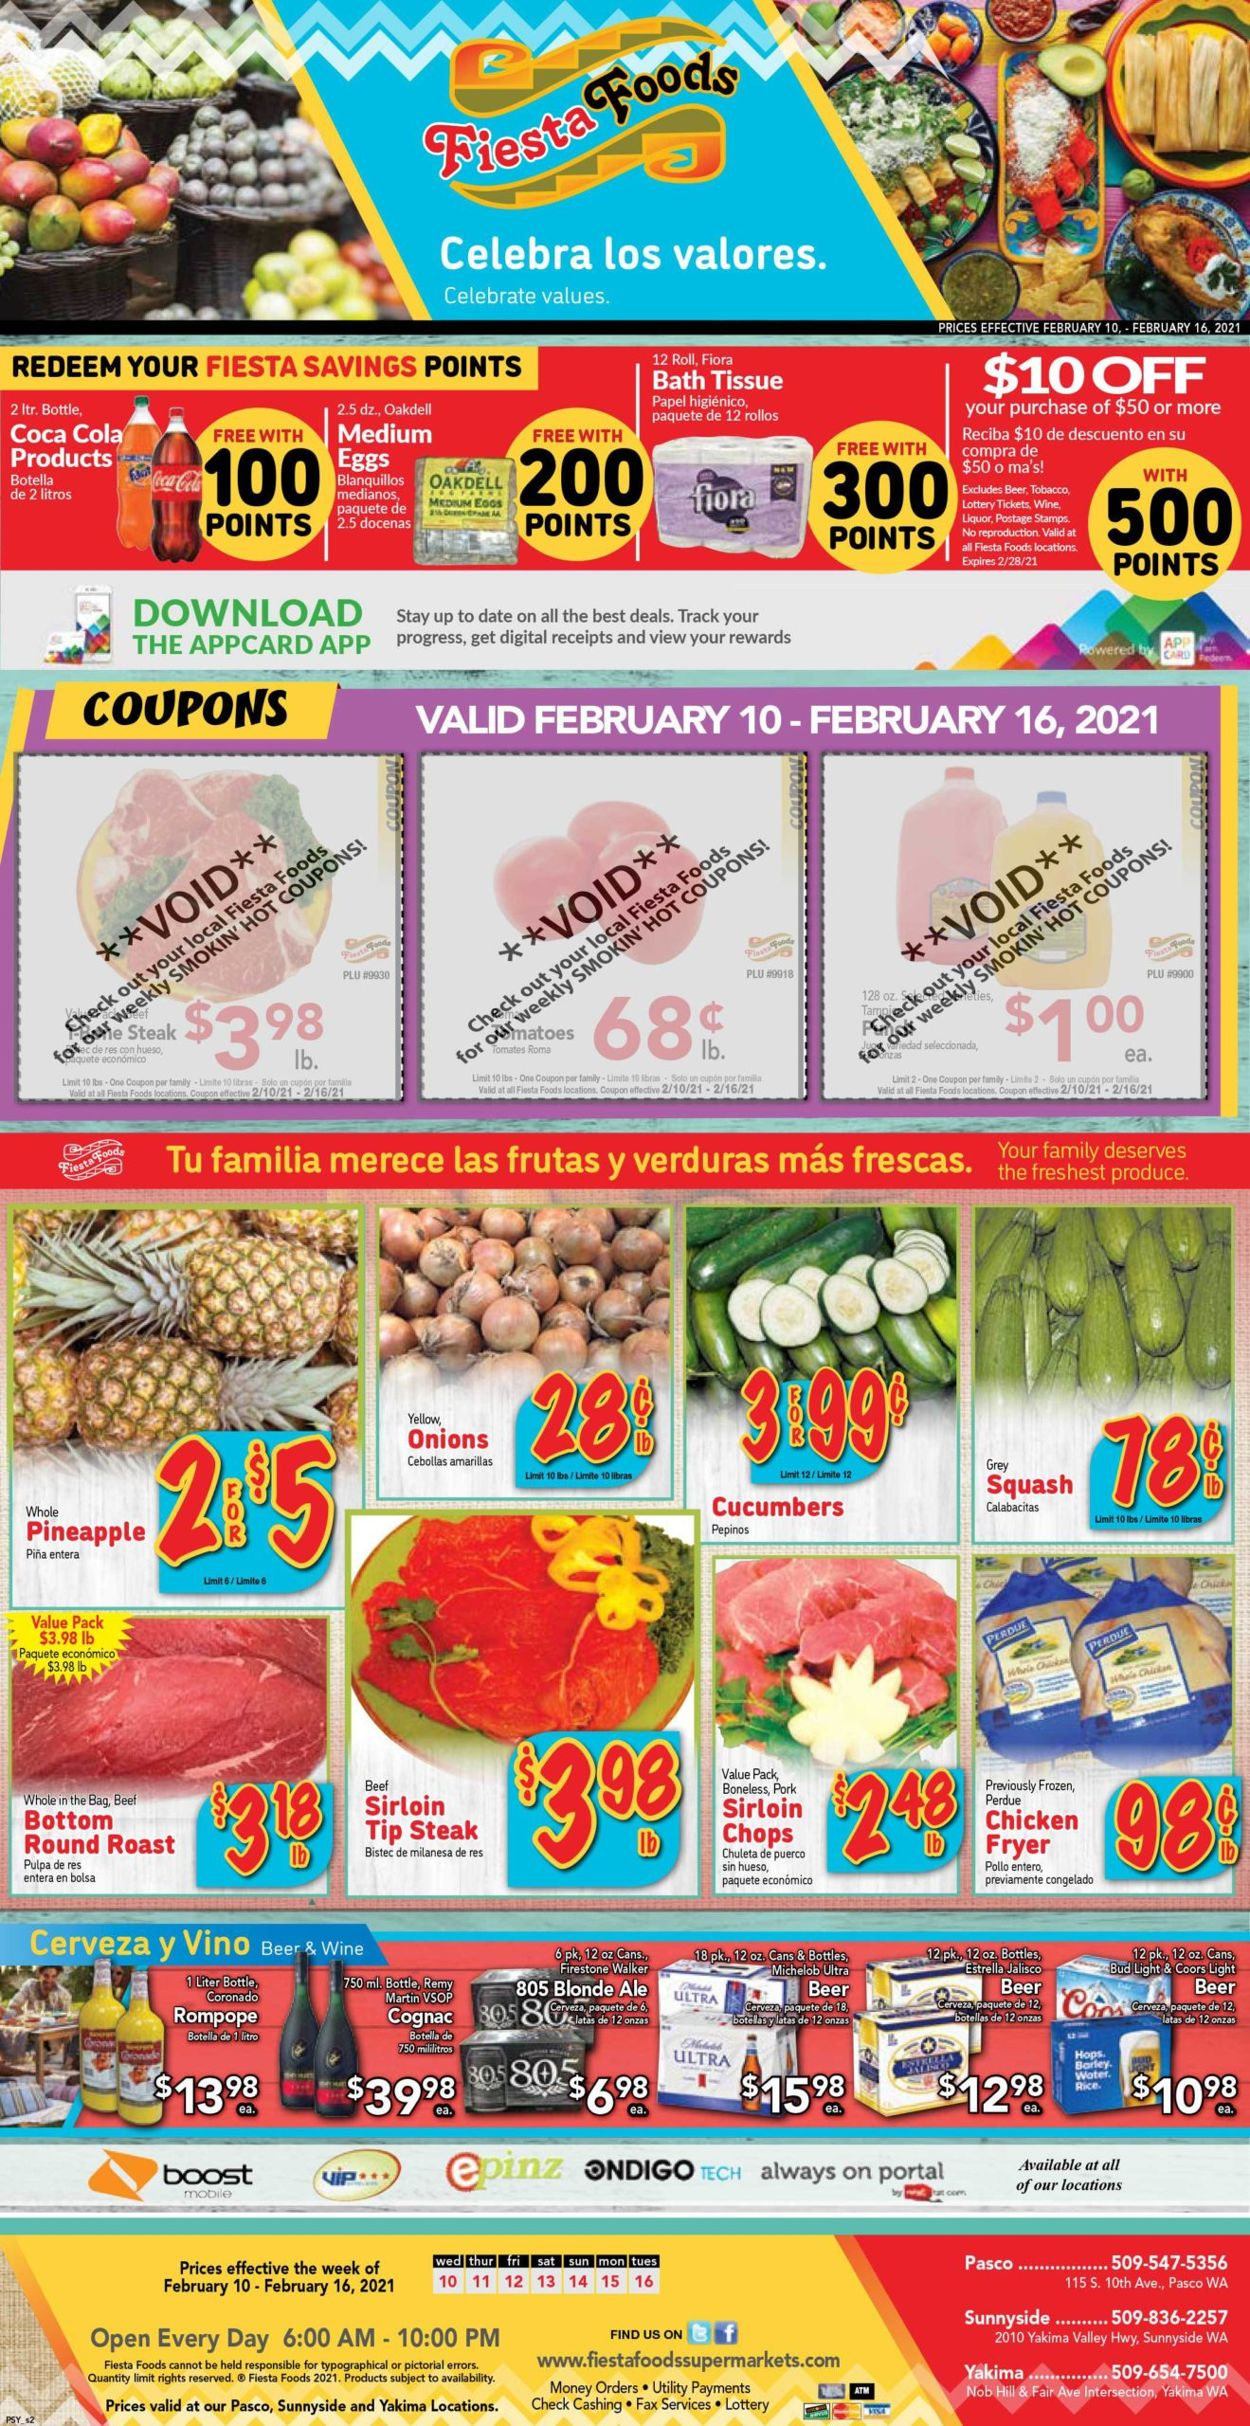 Fiesta Foods SuperMarkets Weekly Ad Circular - valid 02/10-02/16/2021